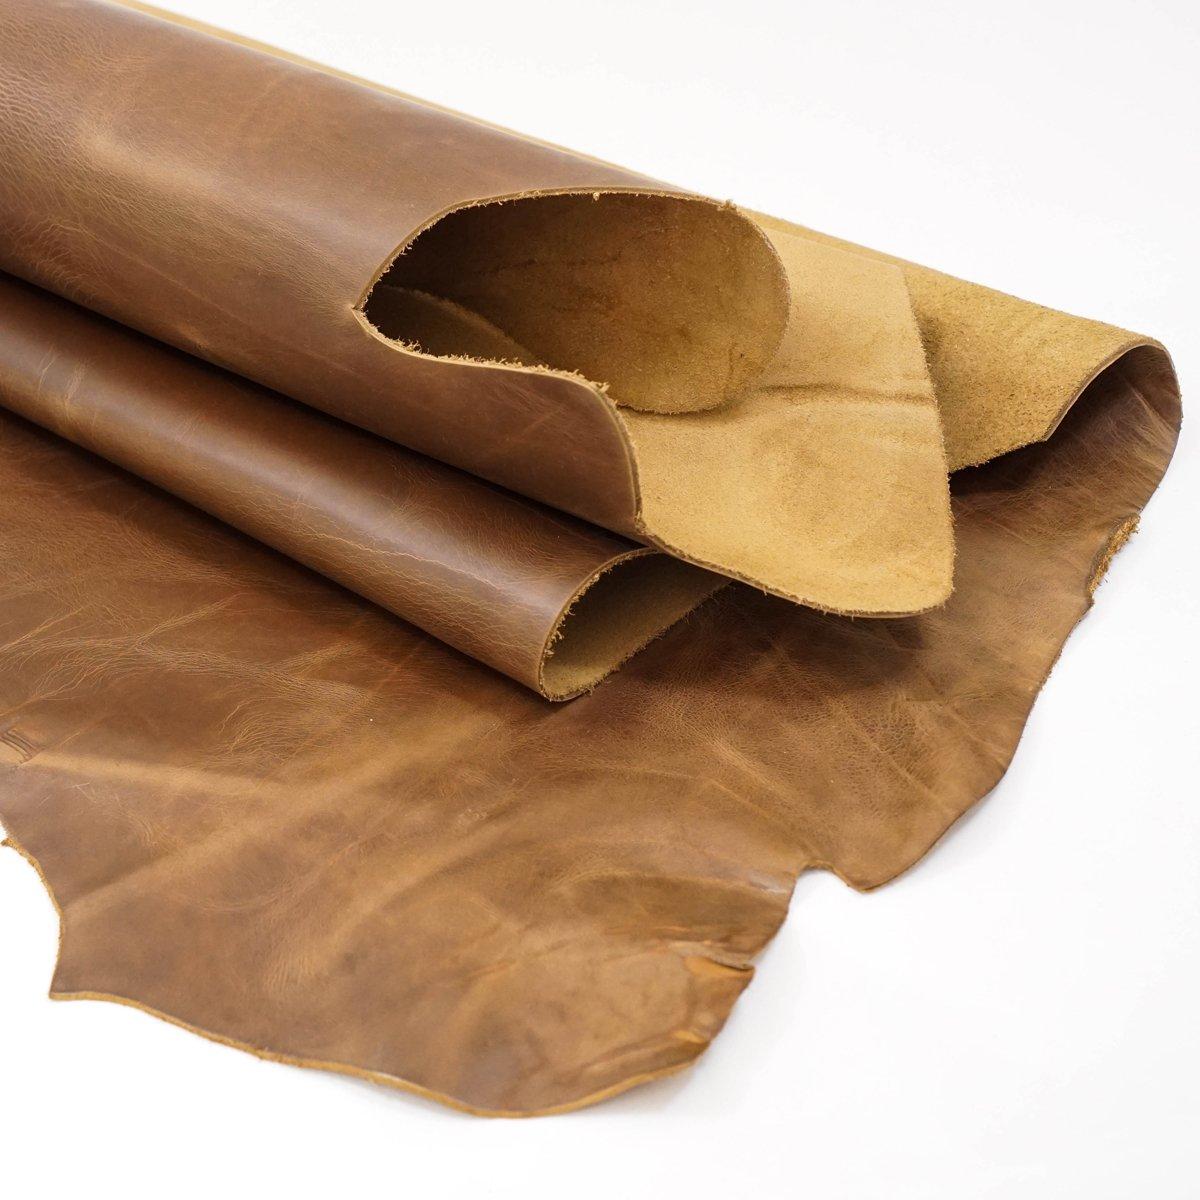 SLC's Irregular Shaped Earthtone Oil Tan Leather Piece 10-13sqft